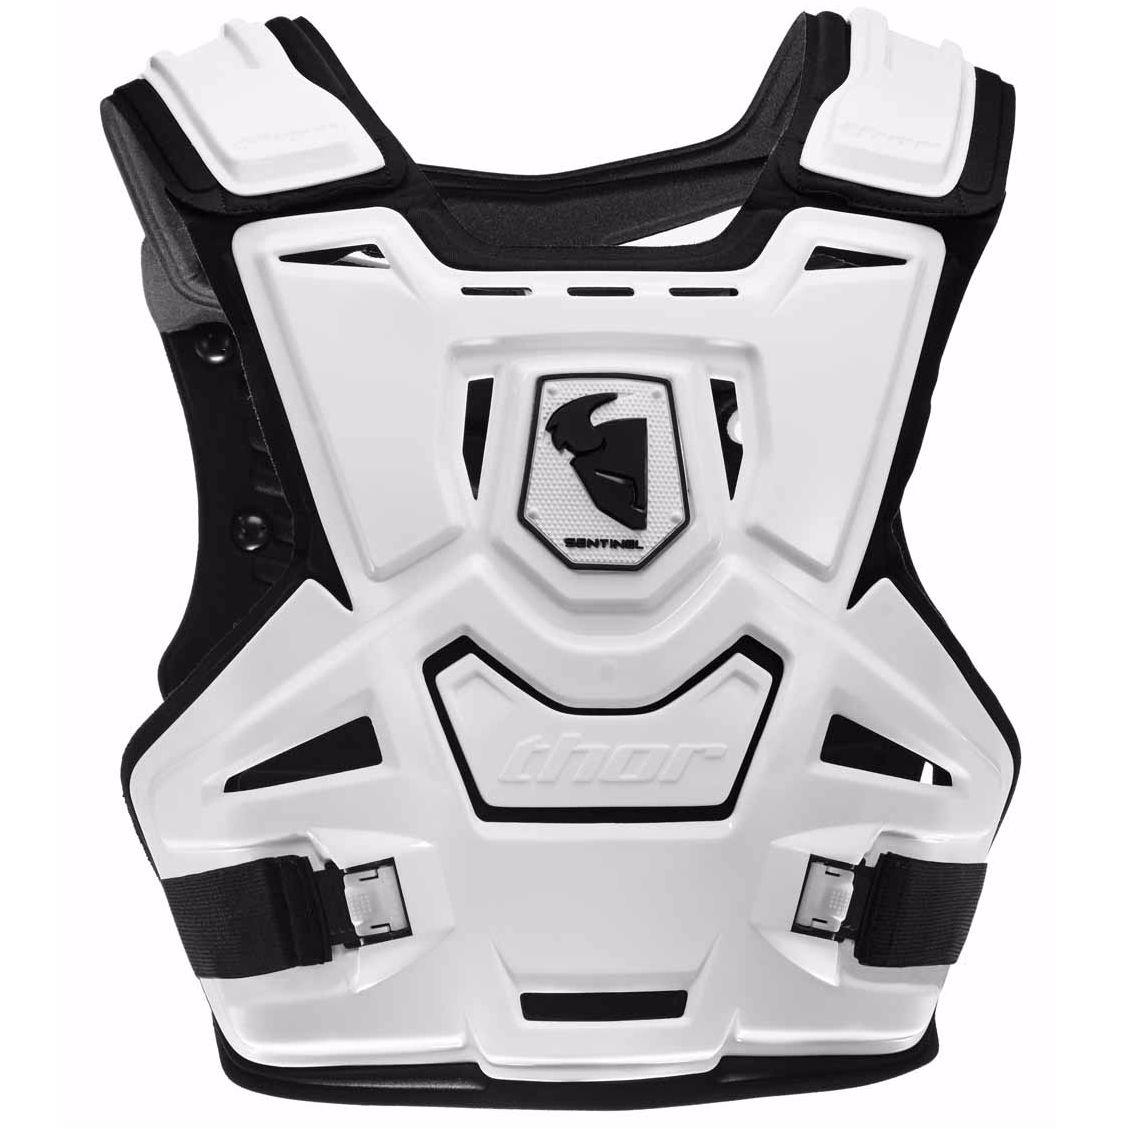 plastron thor sentinel white 2019 protection et accessoires cross. Black Bedroom Furniture Sets. Home Design Ideas